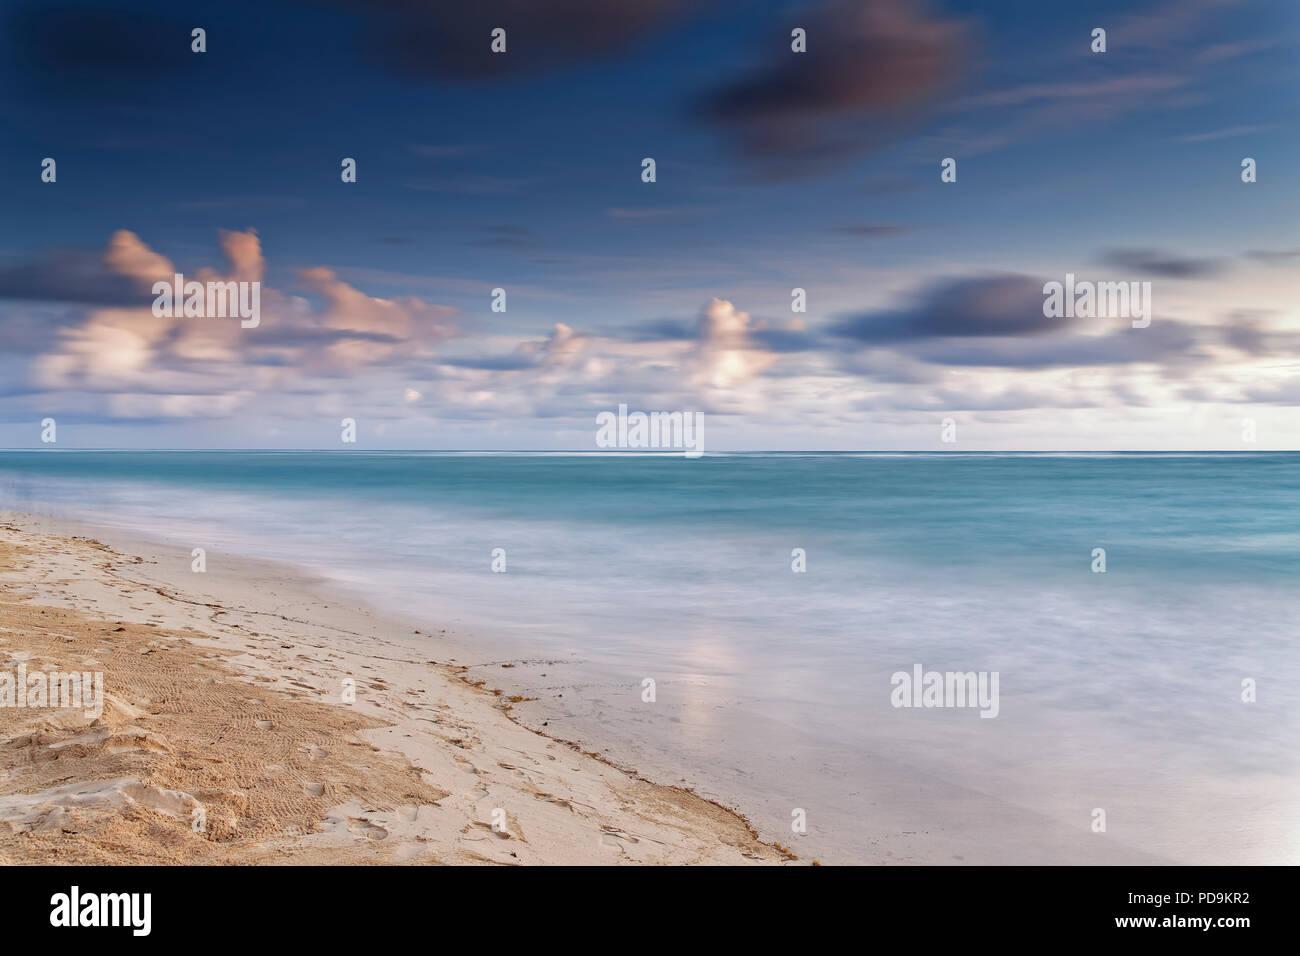 Sandstrand, Meer mit bewölktem Himmel, Playa Bavaro, Atlantik, Punta Cana, Dominikanische Republik Stockbild